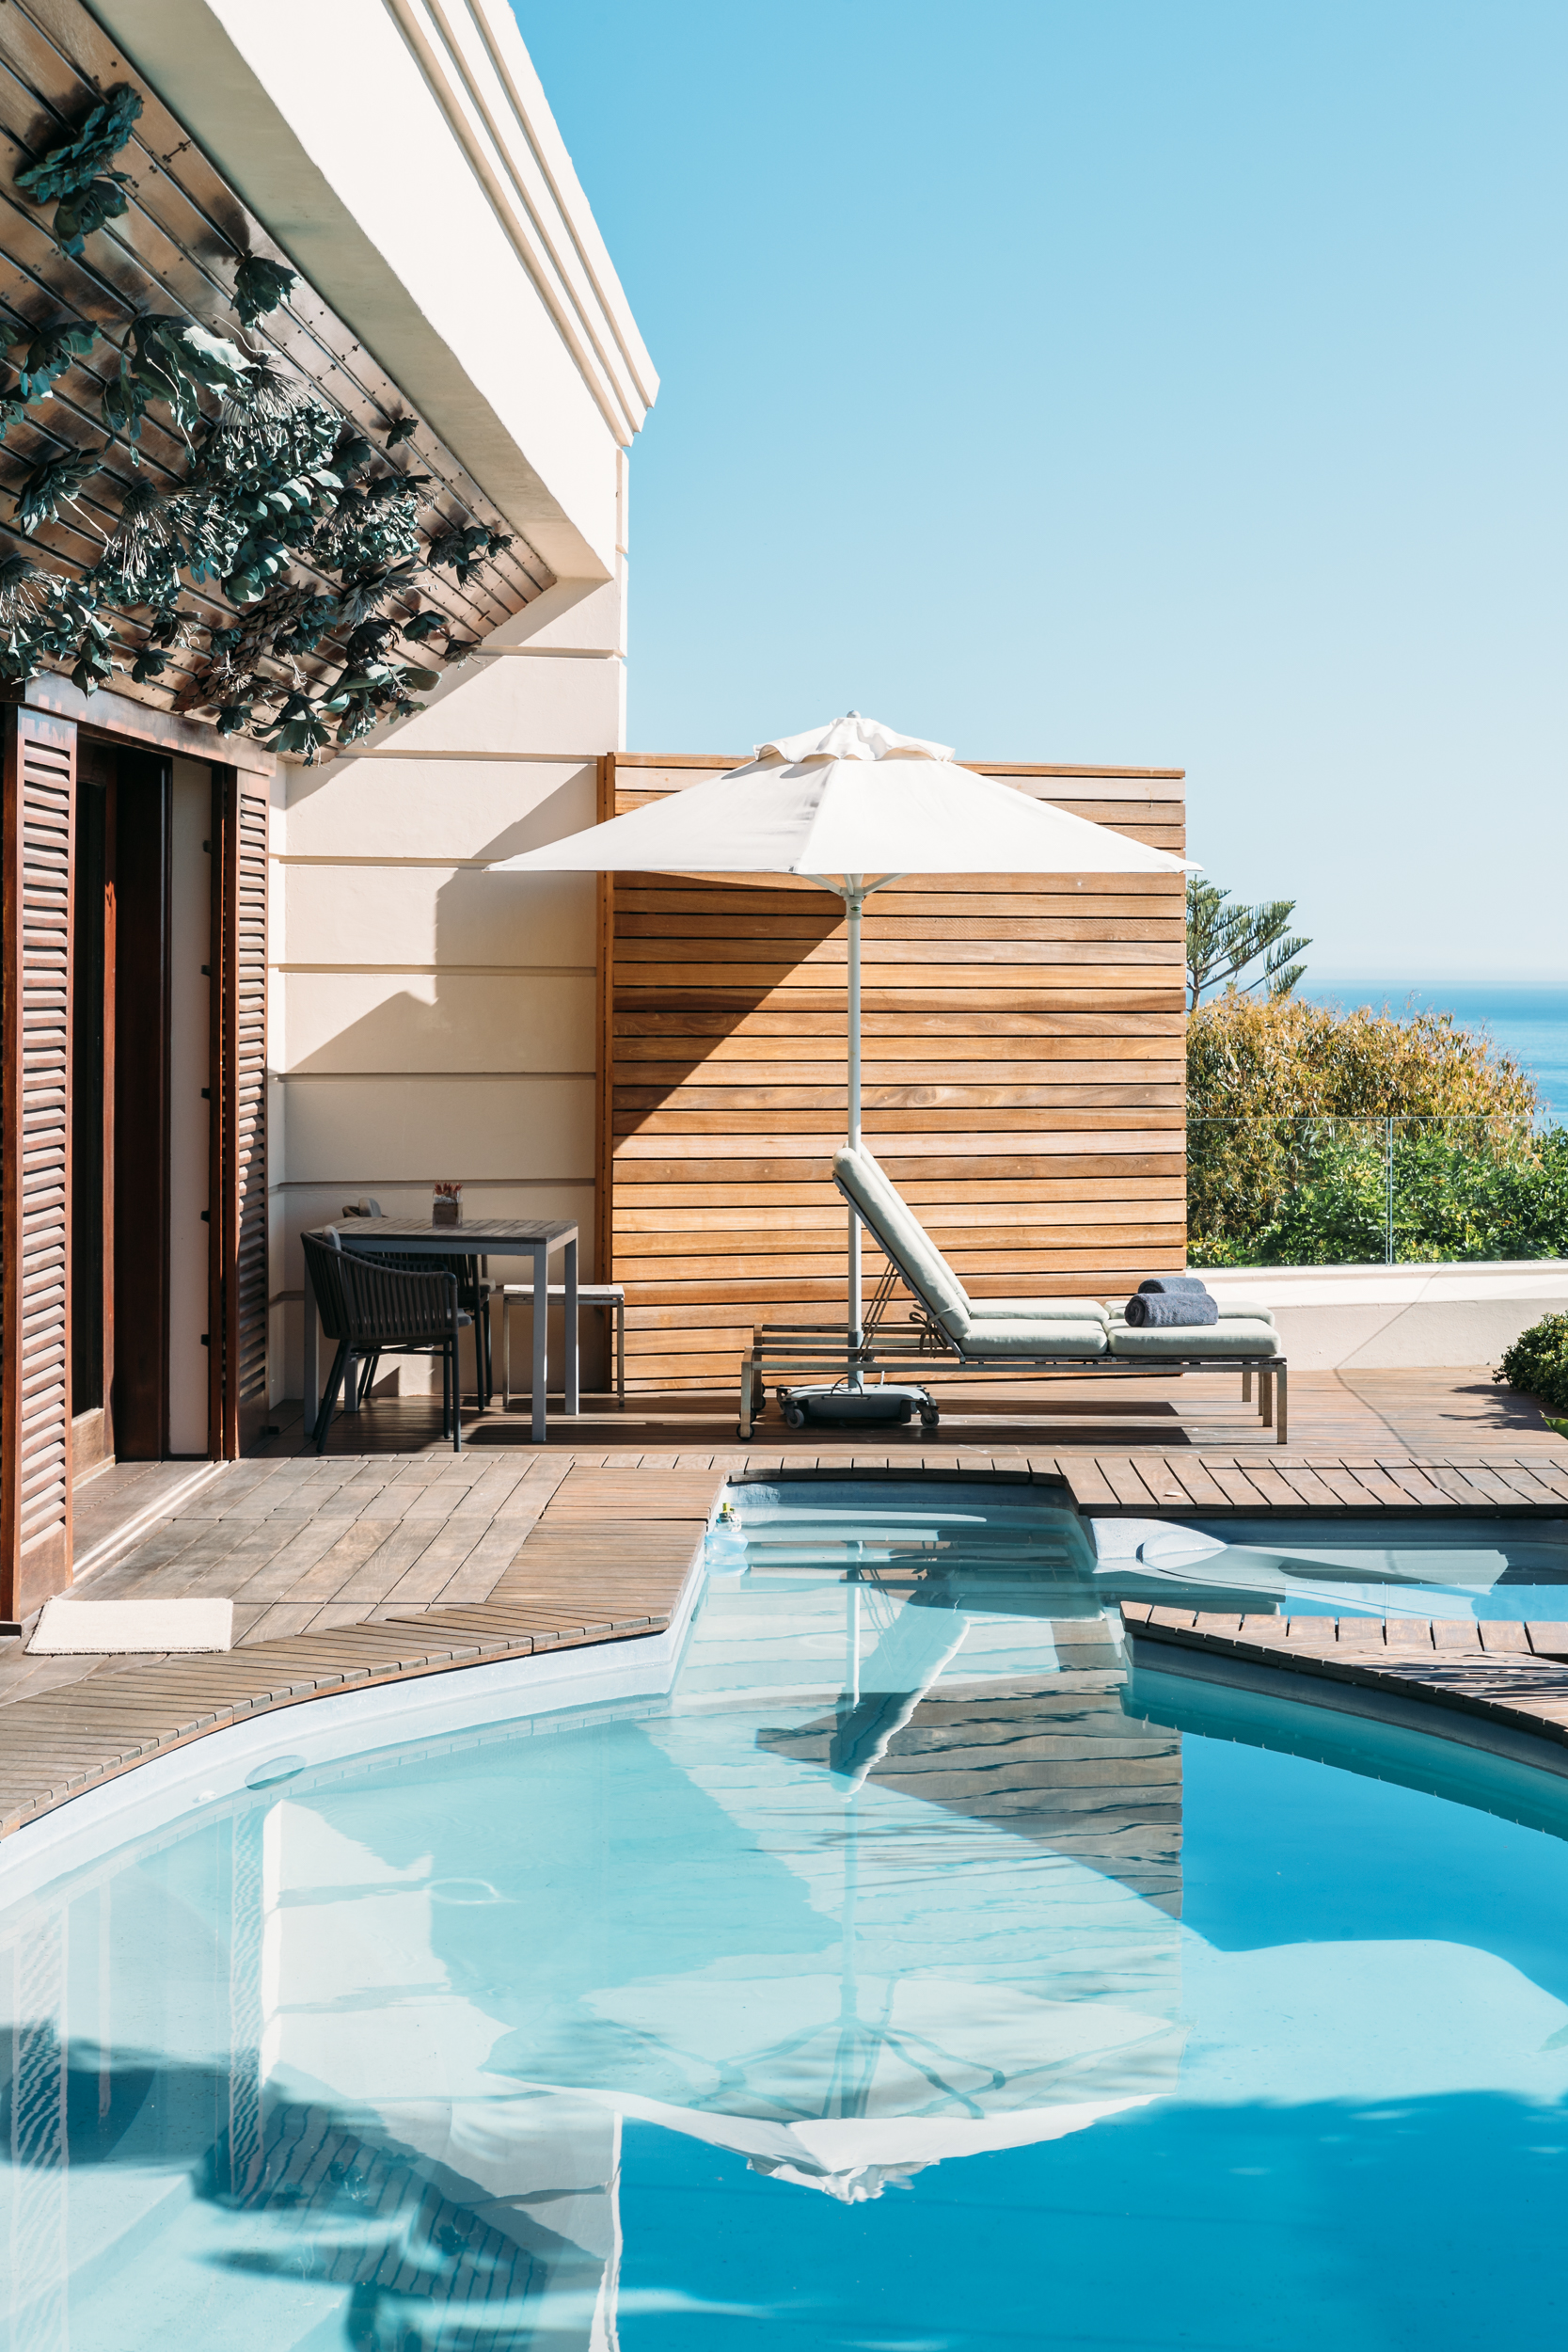 EH - Villa One - Spa Pool Room - 2500px-6.jpg